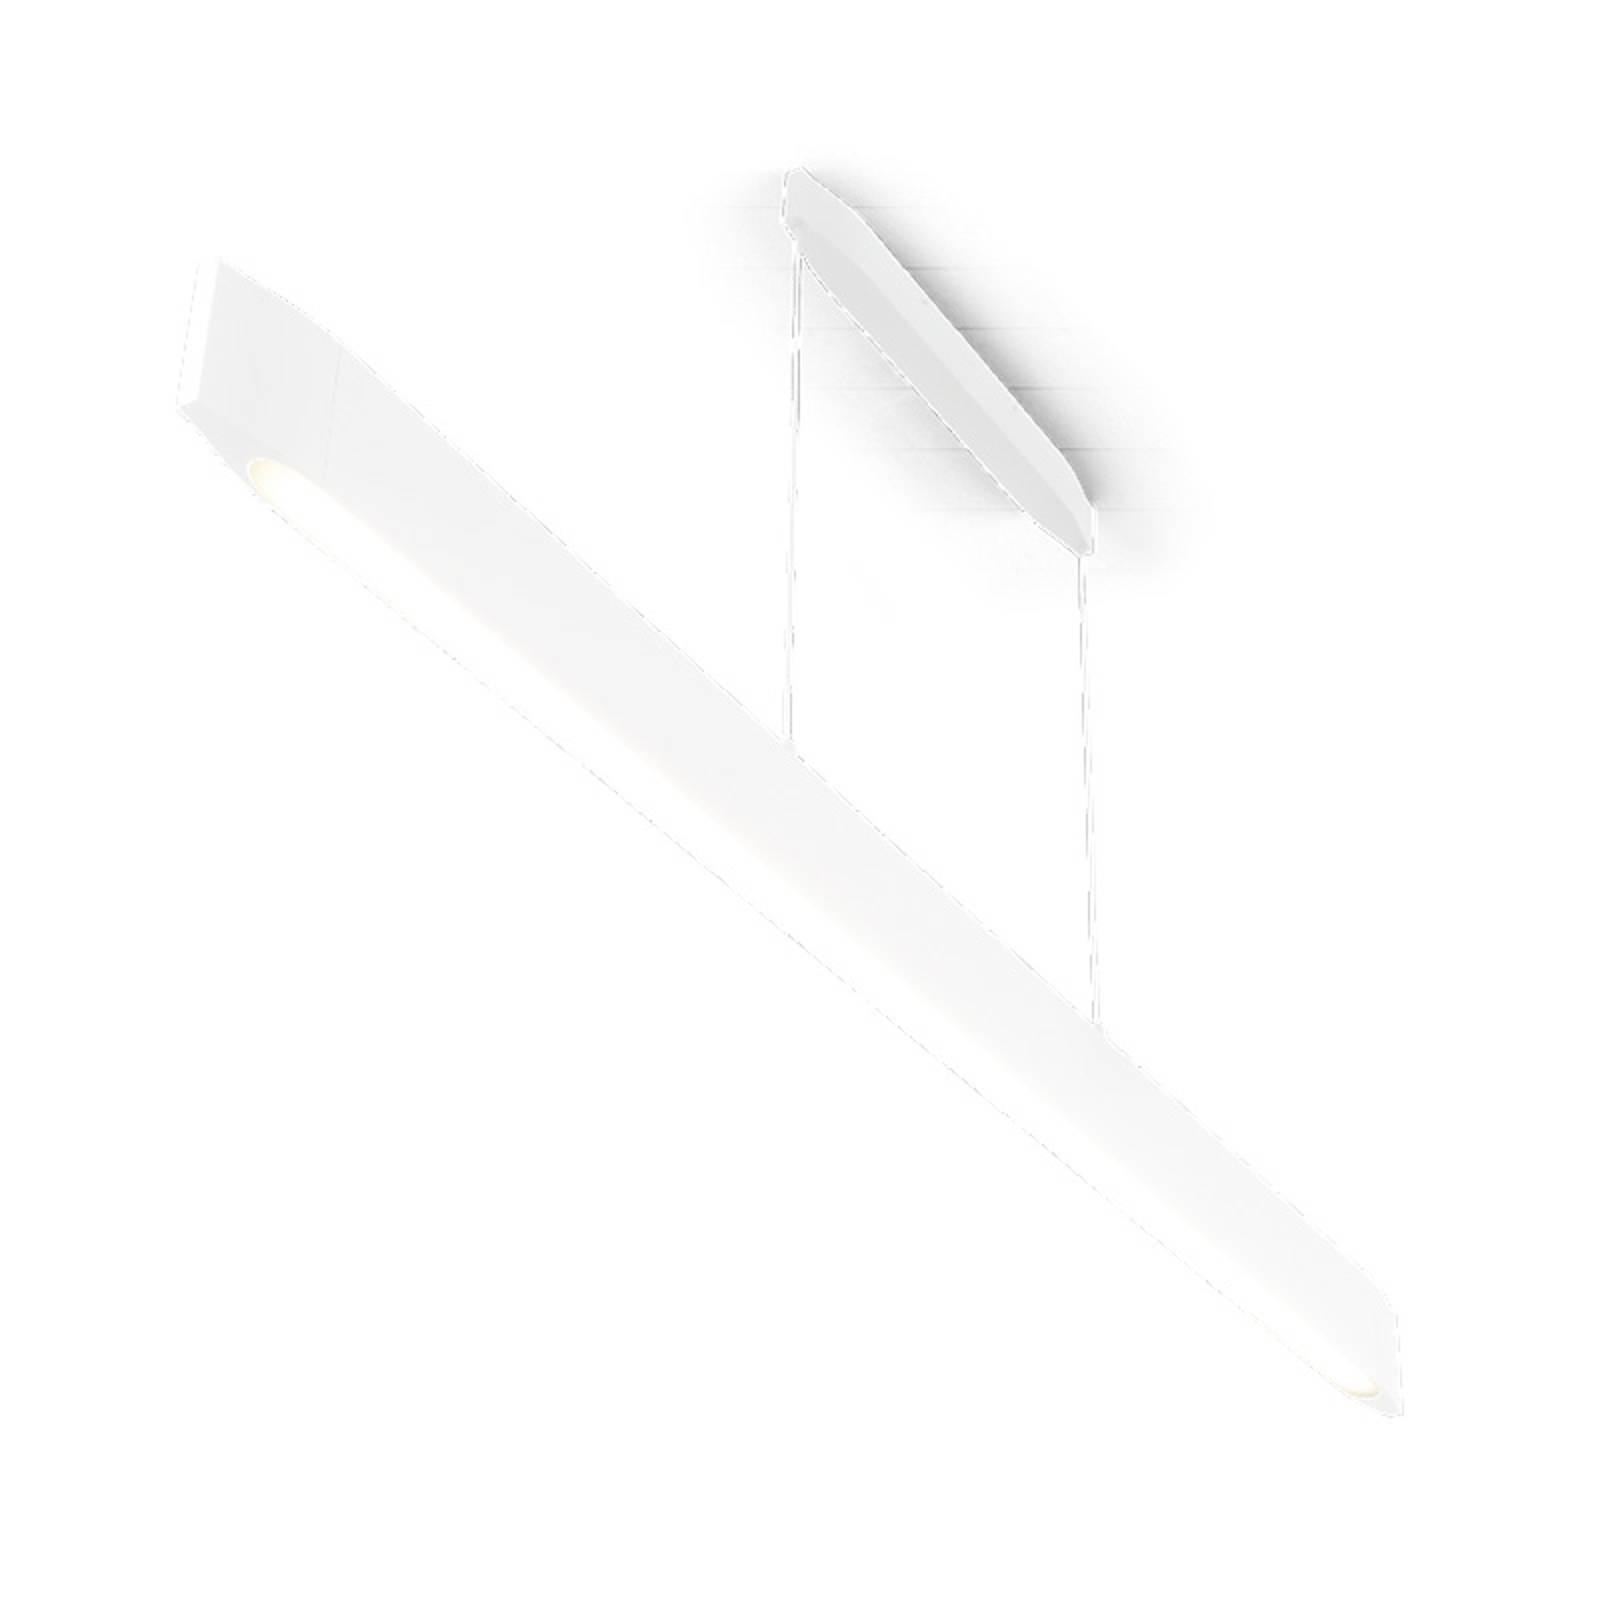 WEVER & DUCRÉ Ello 13.0 LED sospensione bianco